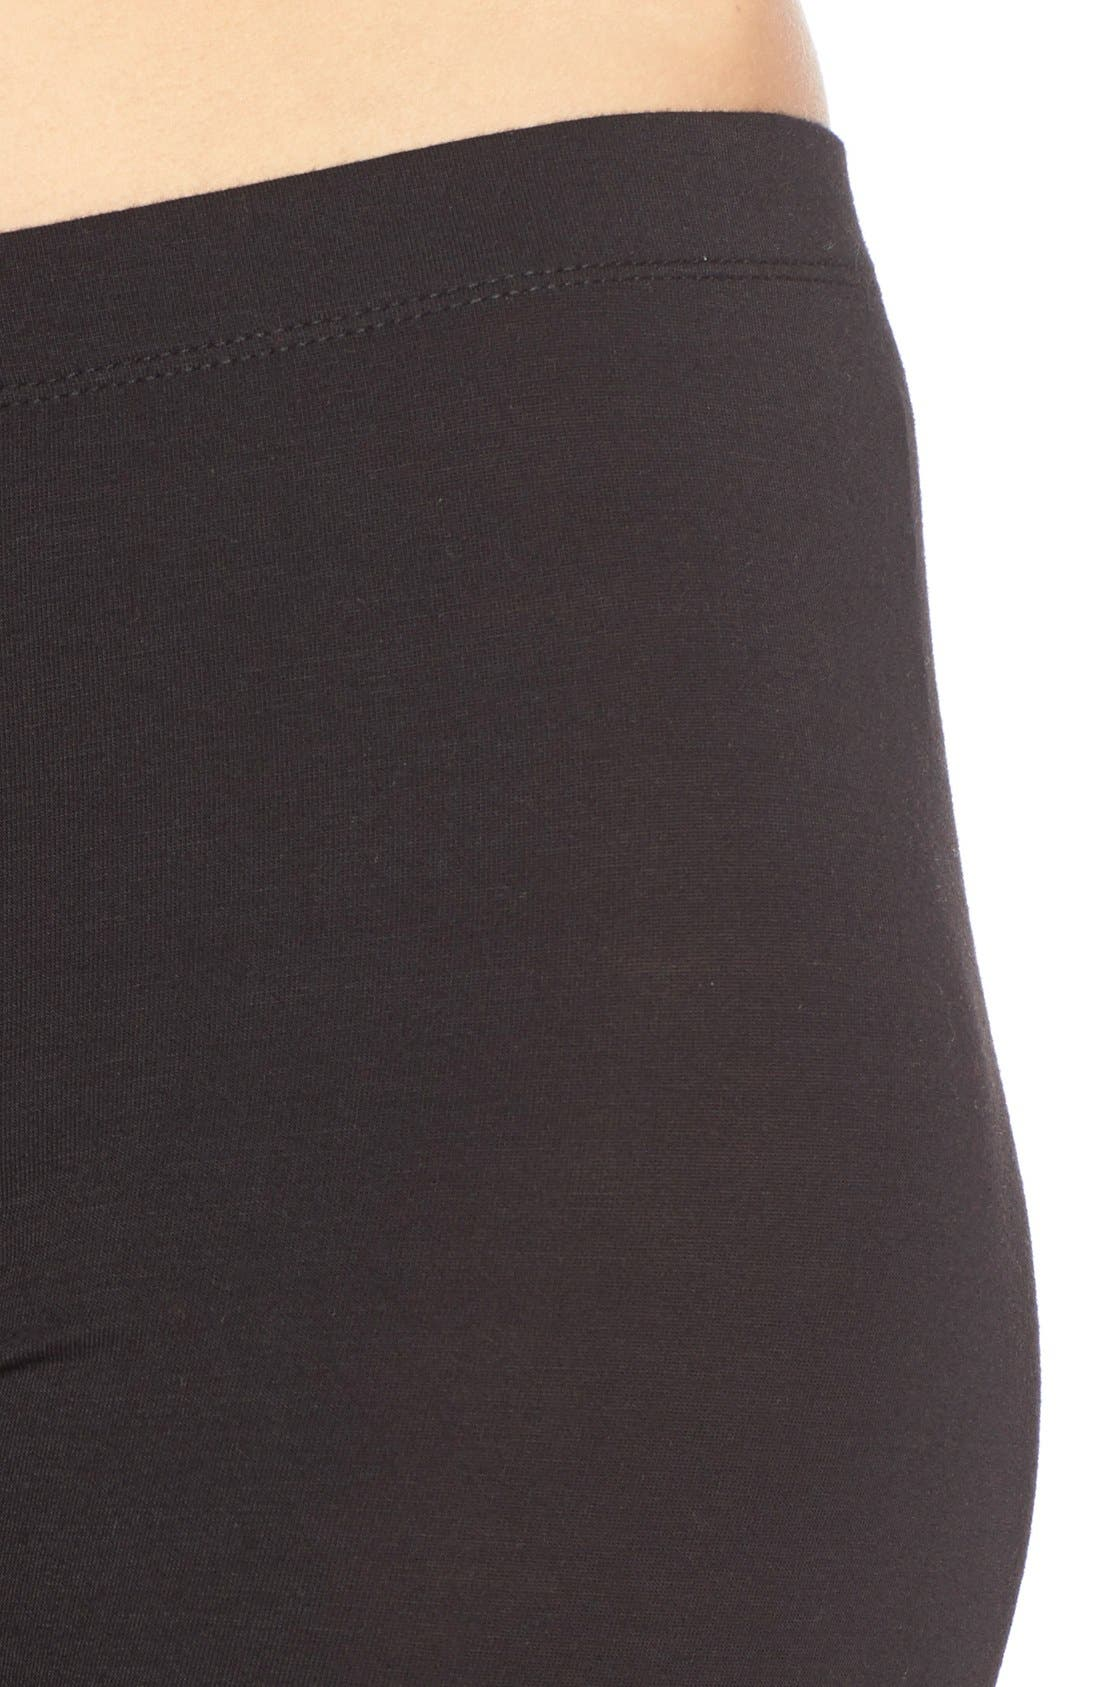 Alternate Image 4  - DKNY 'City Essentials' Leggings